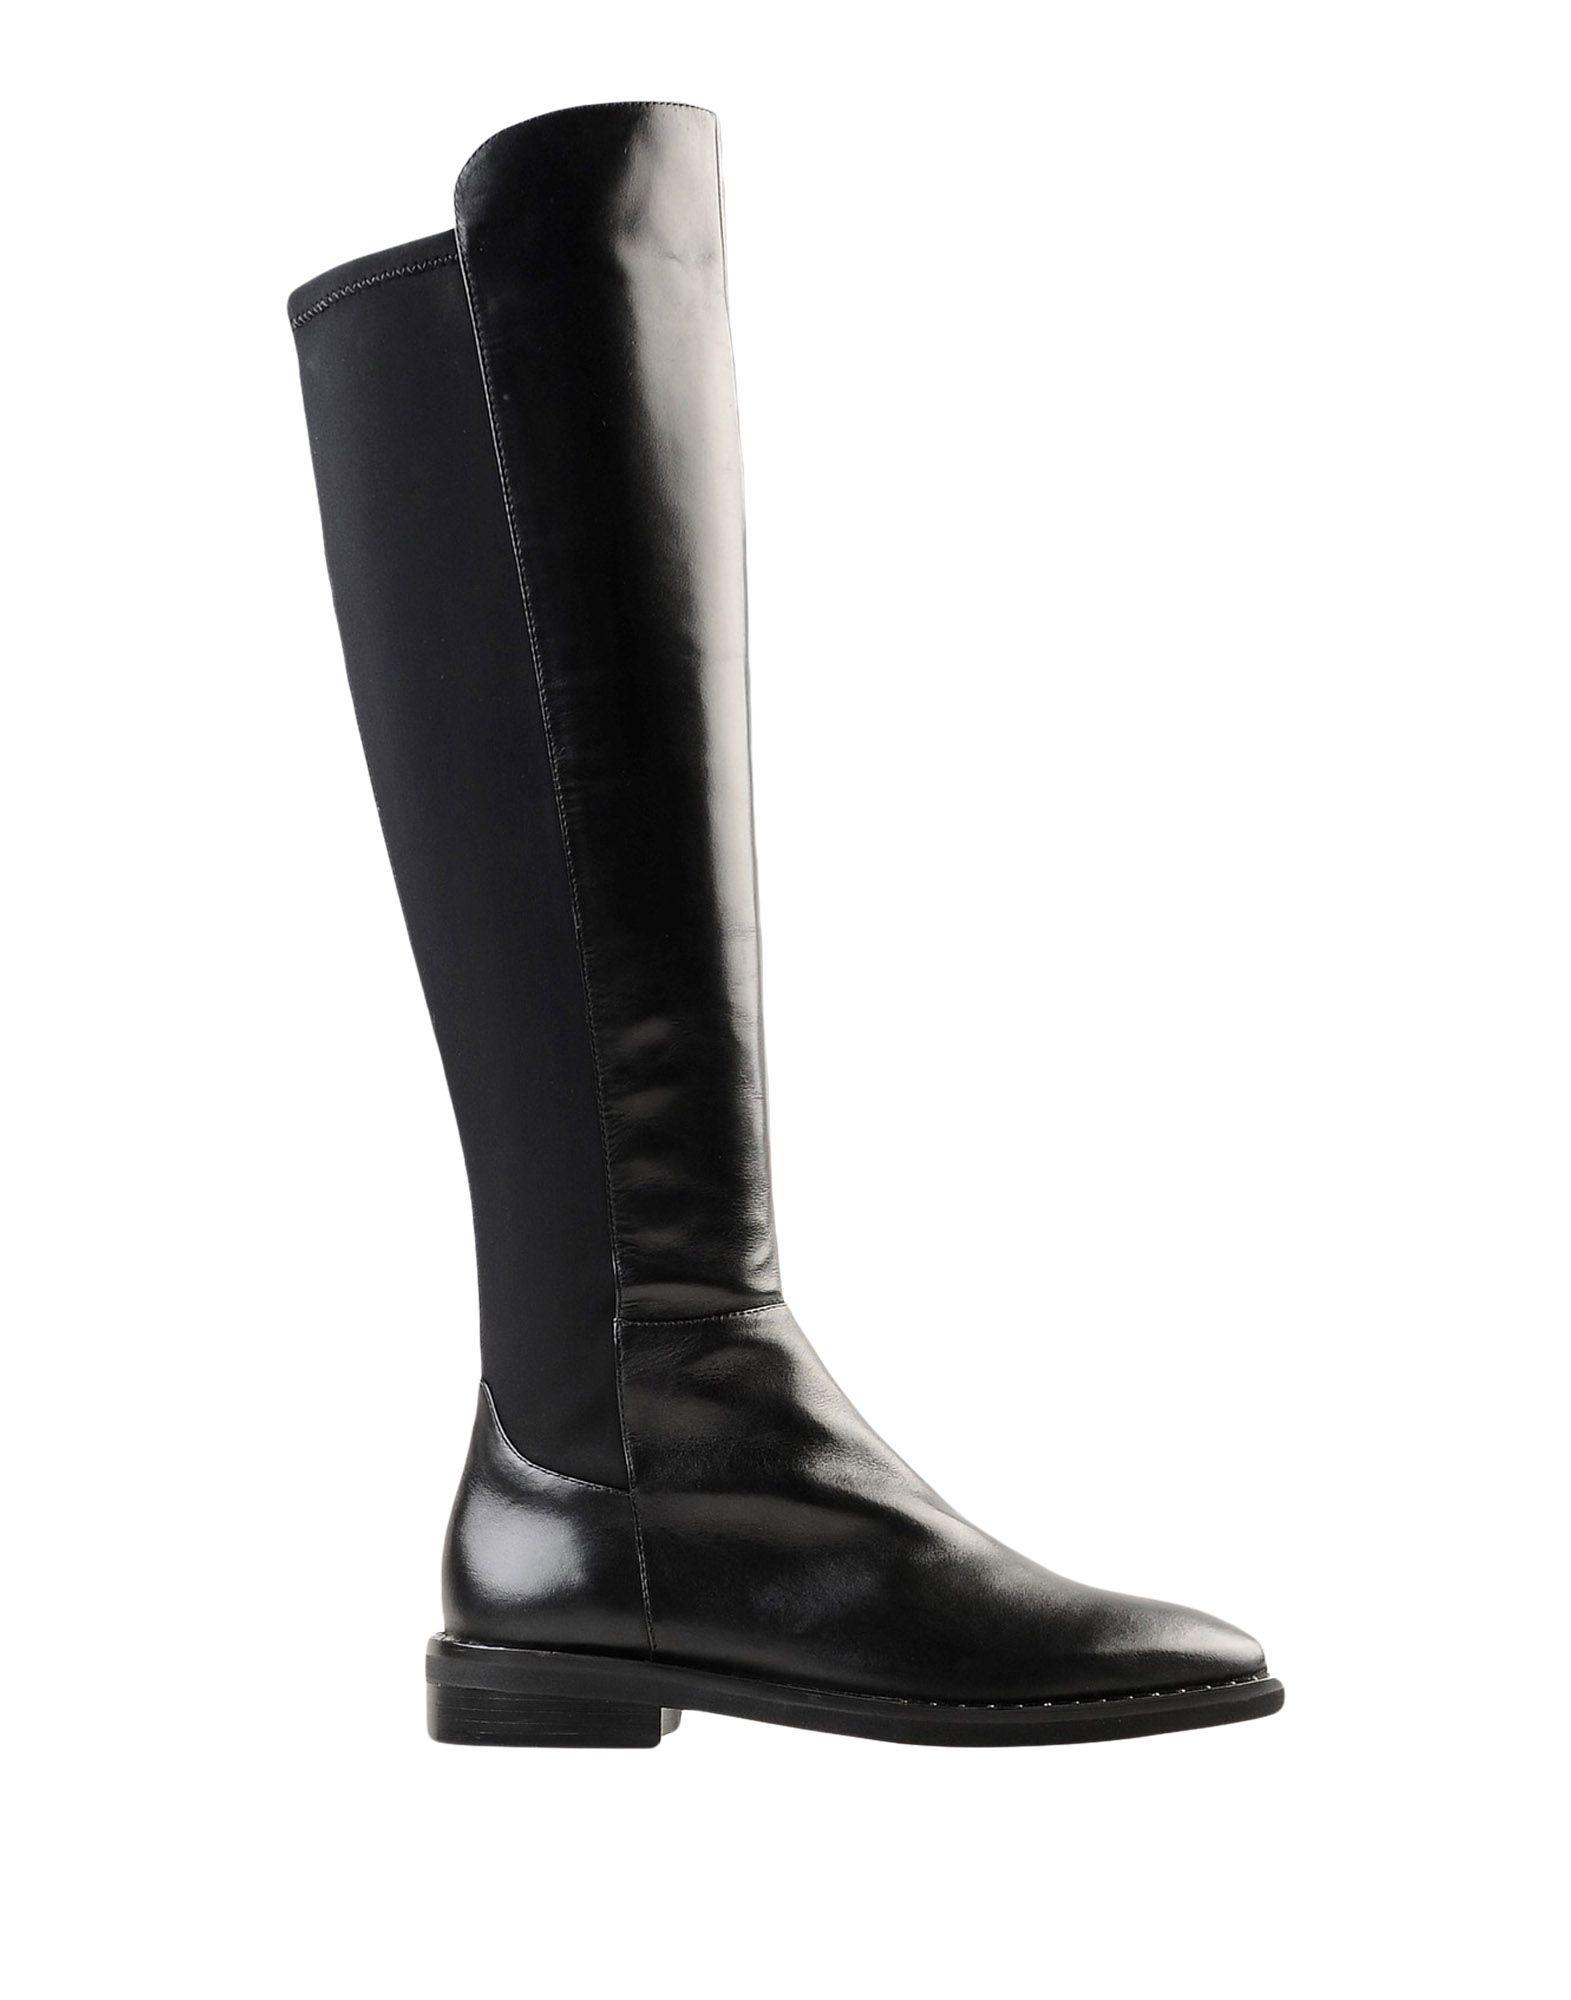 Bruno Premi Stiefel Damen  11538626AKGut aussehende strapazierfähige Schuhe